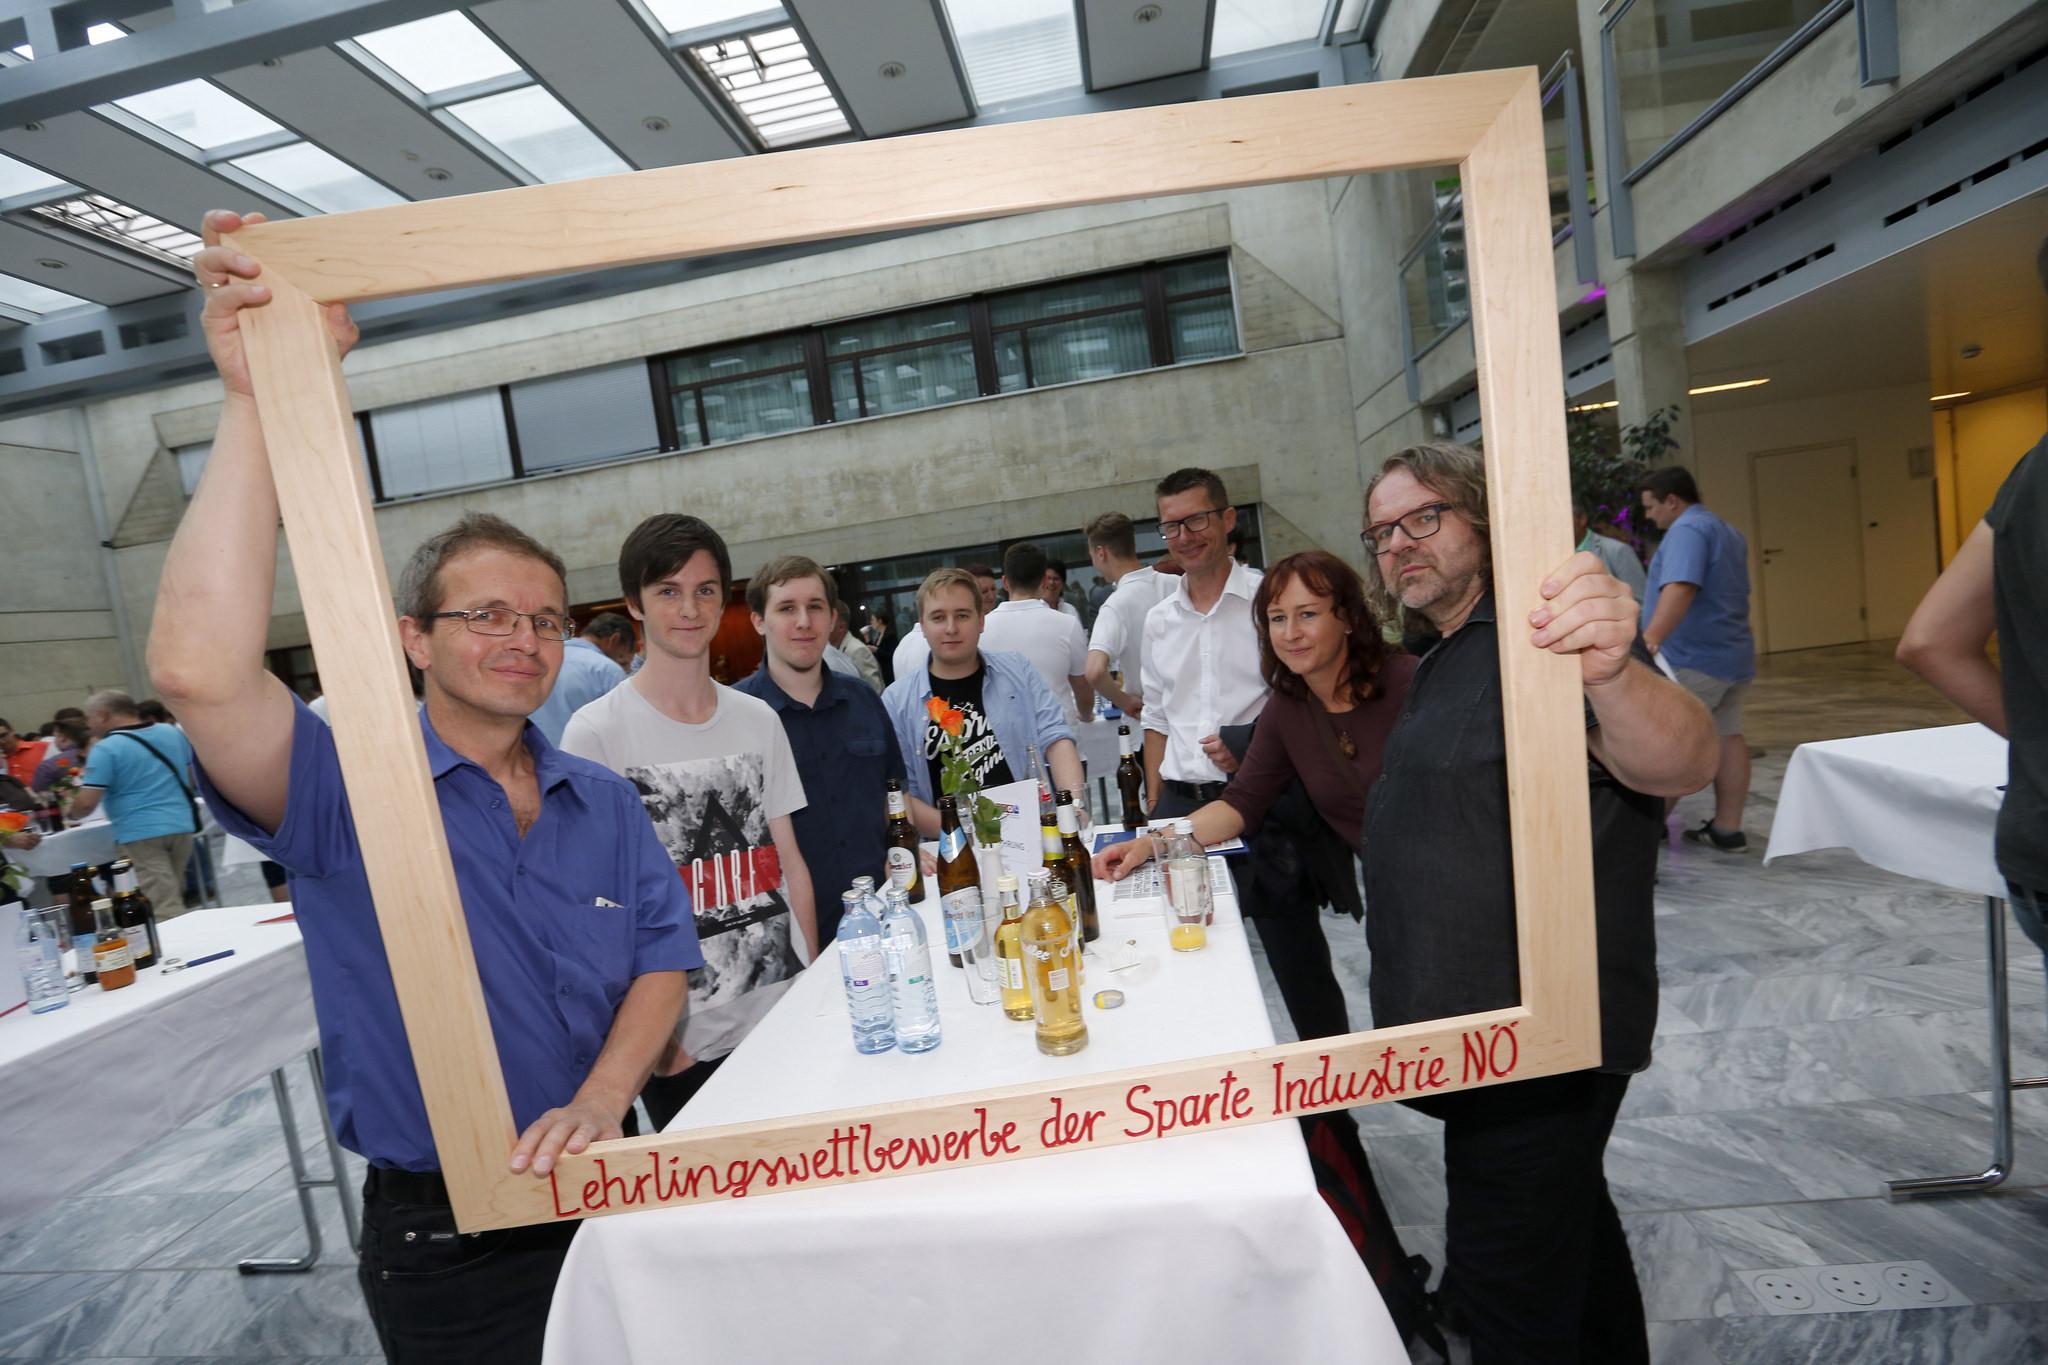 Lehrlingswettbewerb, Siegerehrung am 23.6.2017 in St. Pölten, Fa. waldsoft, Foto WKO Tanja Wagner